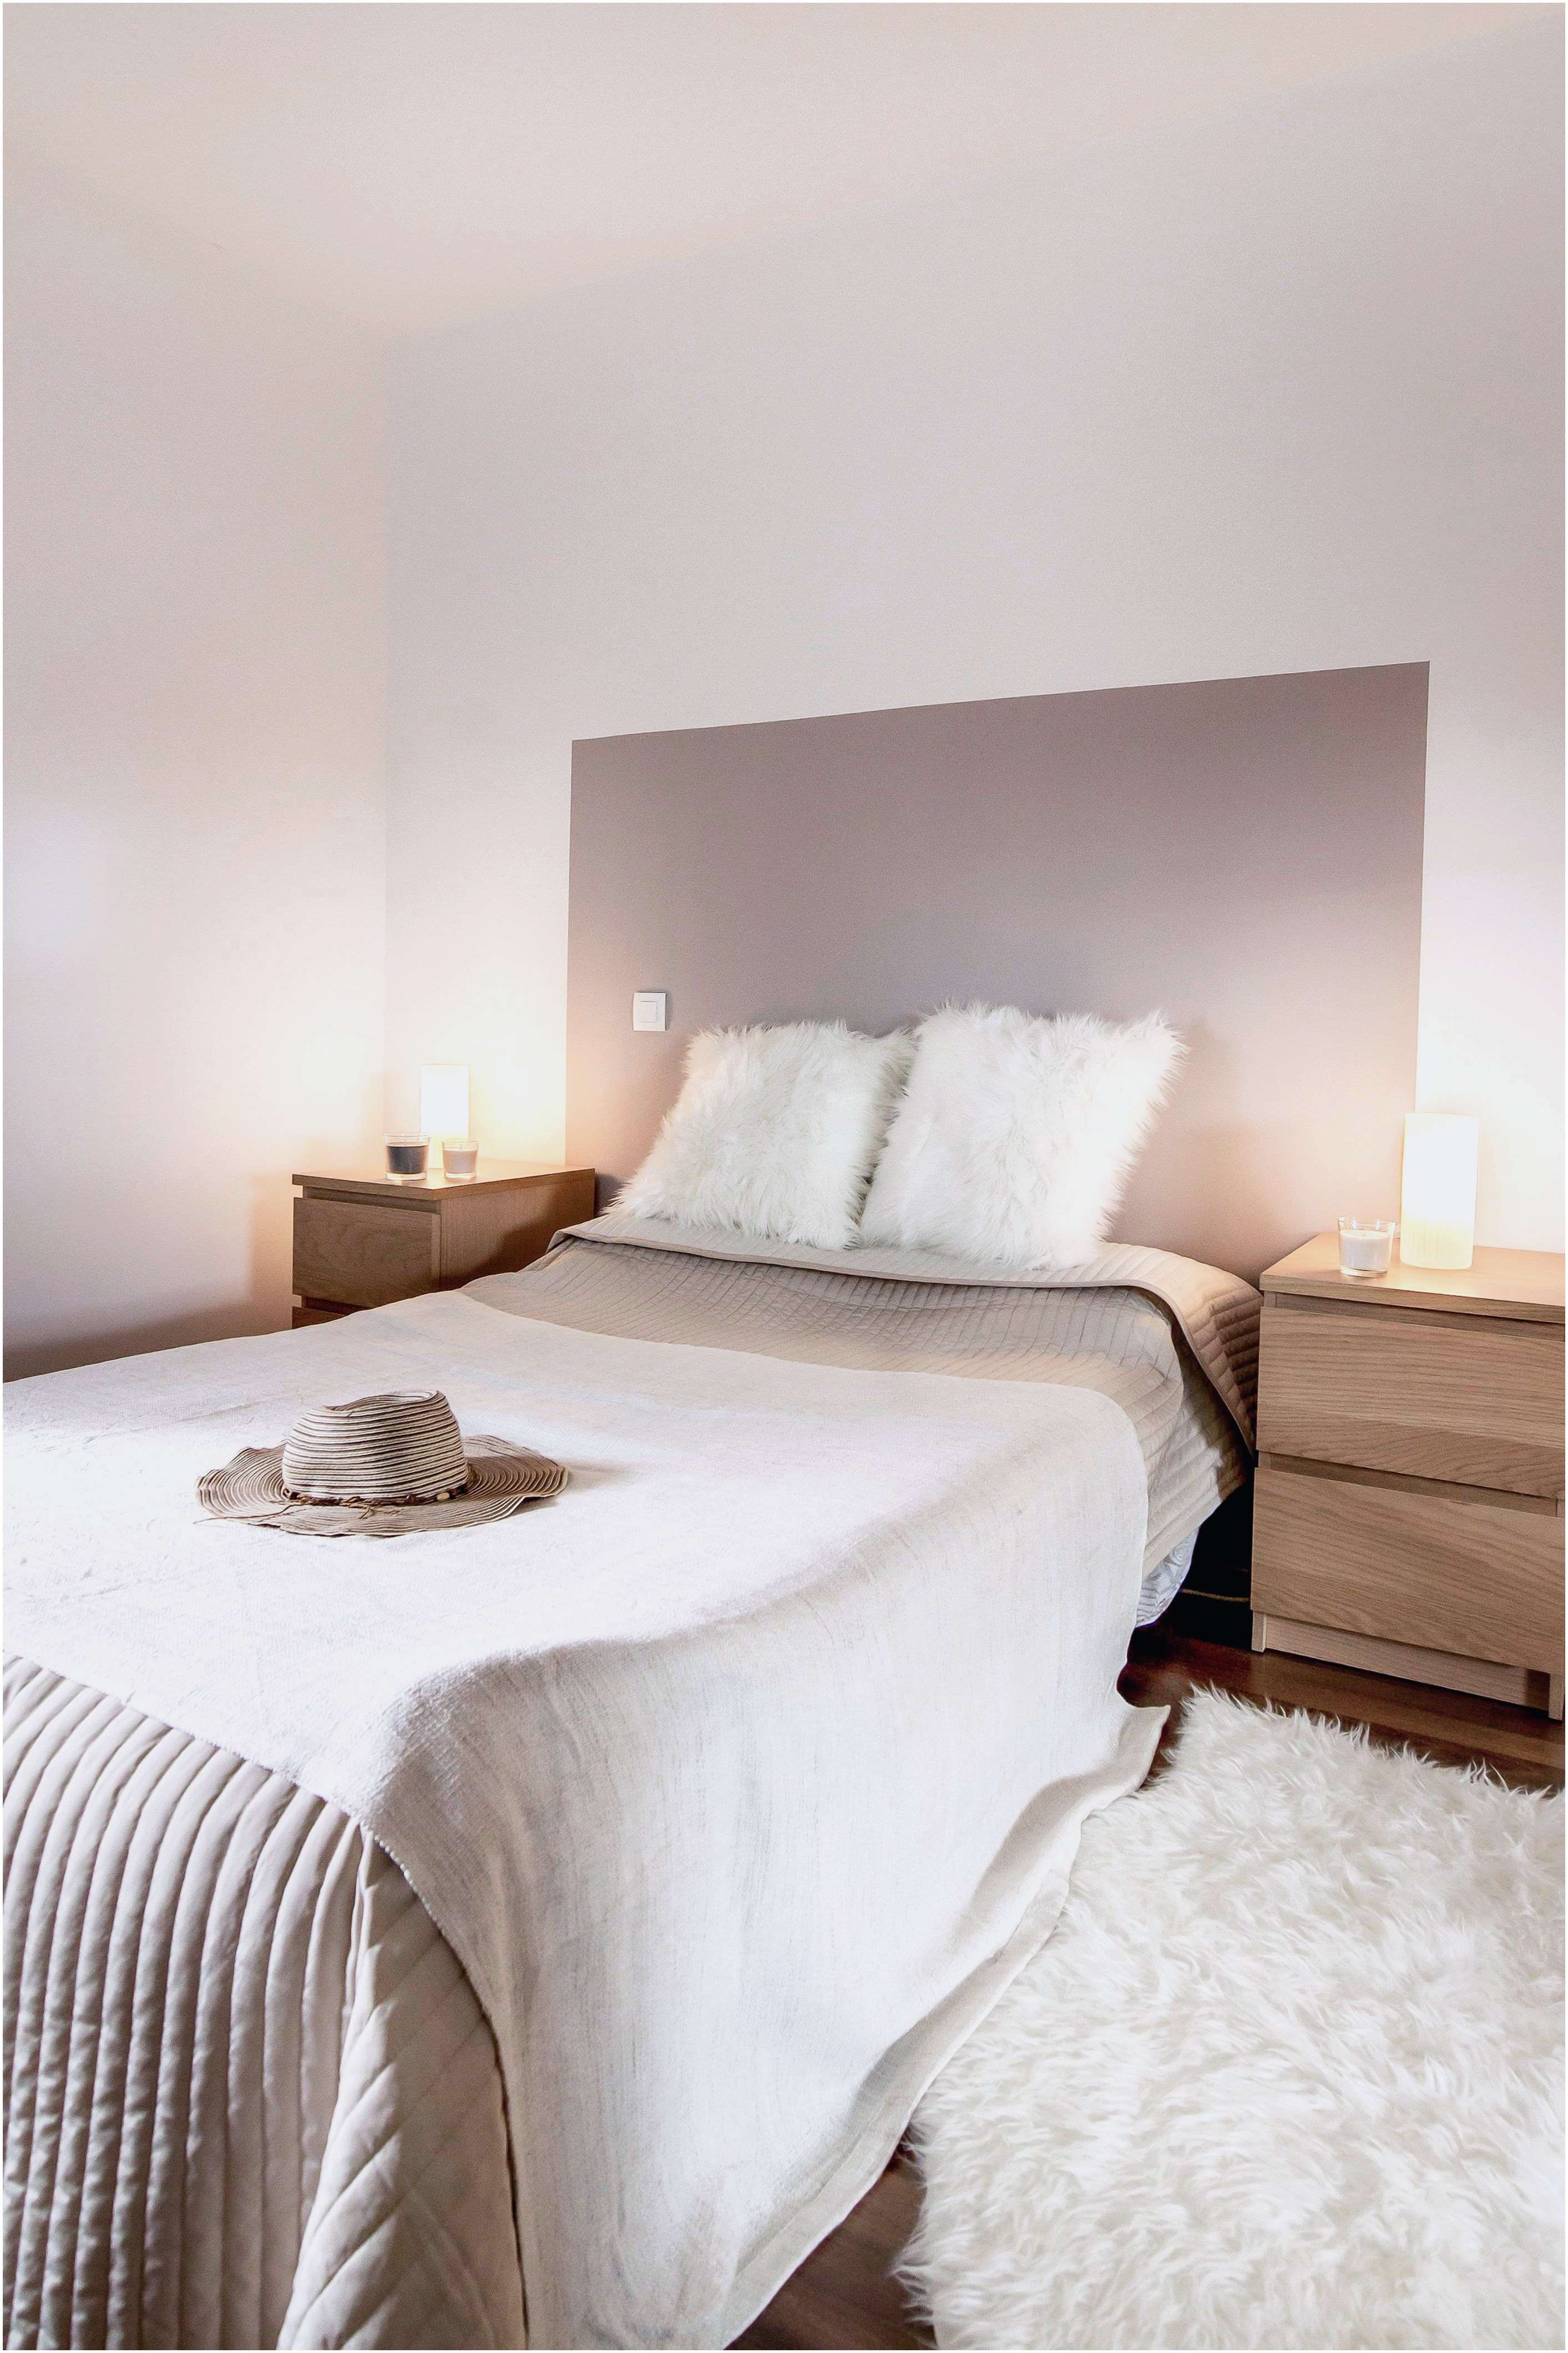 Lit Mezzanine Adulte solide Inspirant Luxe Lit Mezzanine Ikea Stuva Nouveau Lit Mezzanine Adulte solide